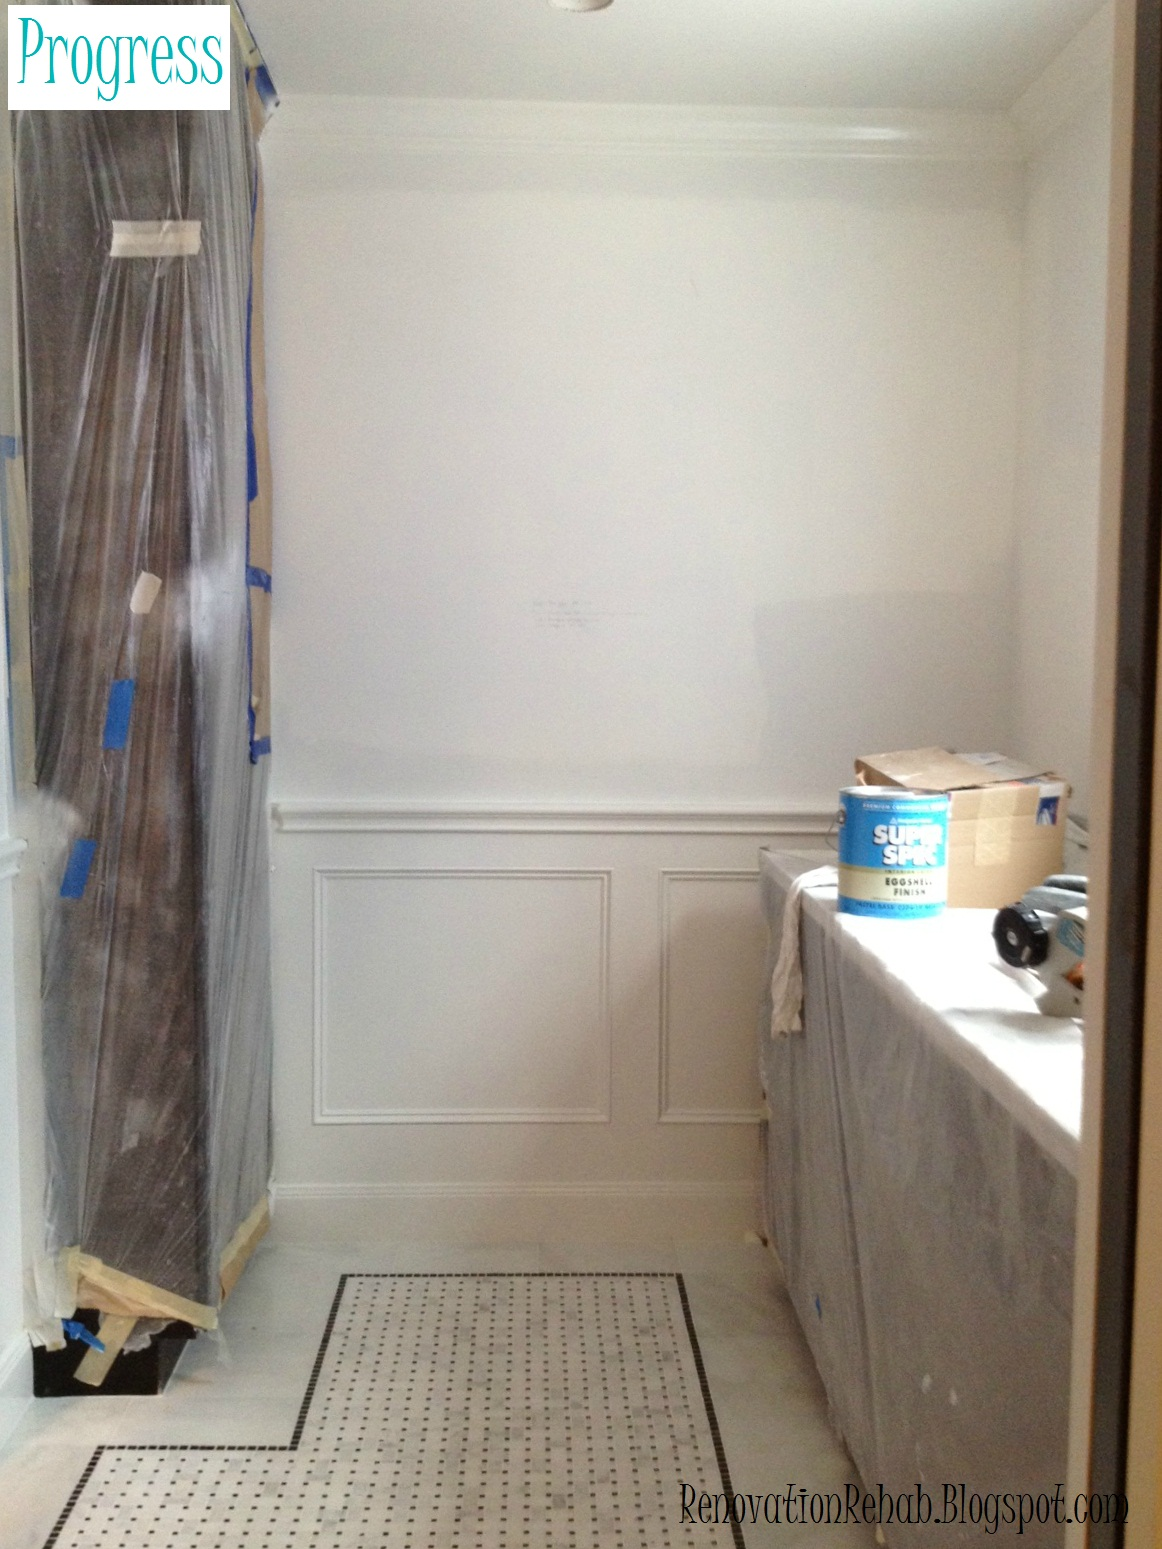 Renovation Rehab: Vintage Bathroom Remodel - Part 3